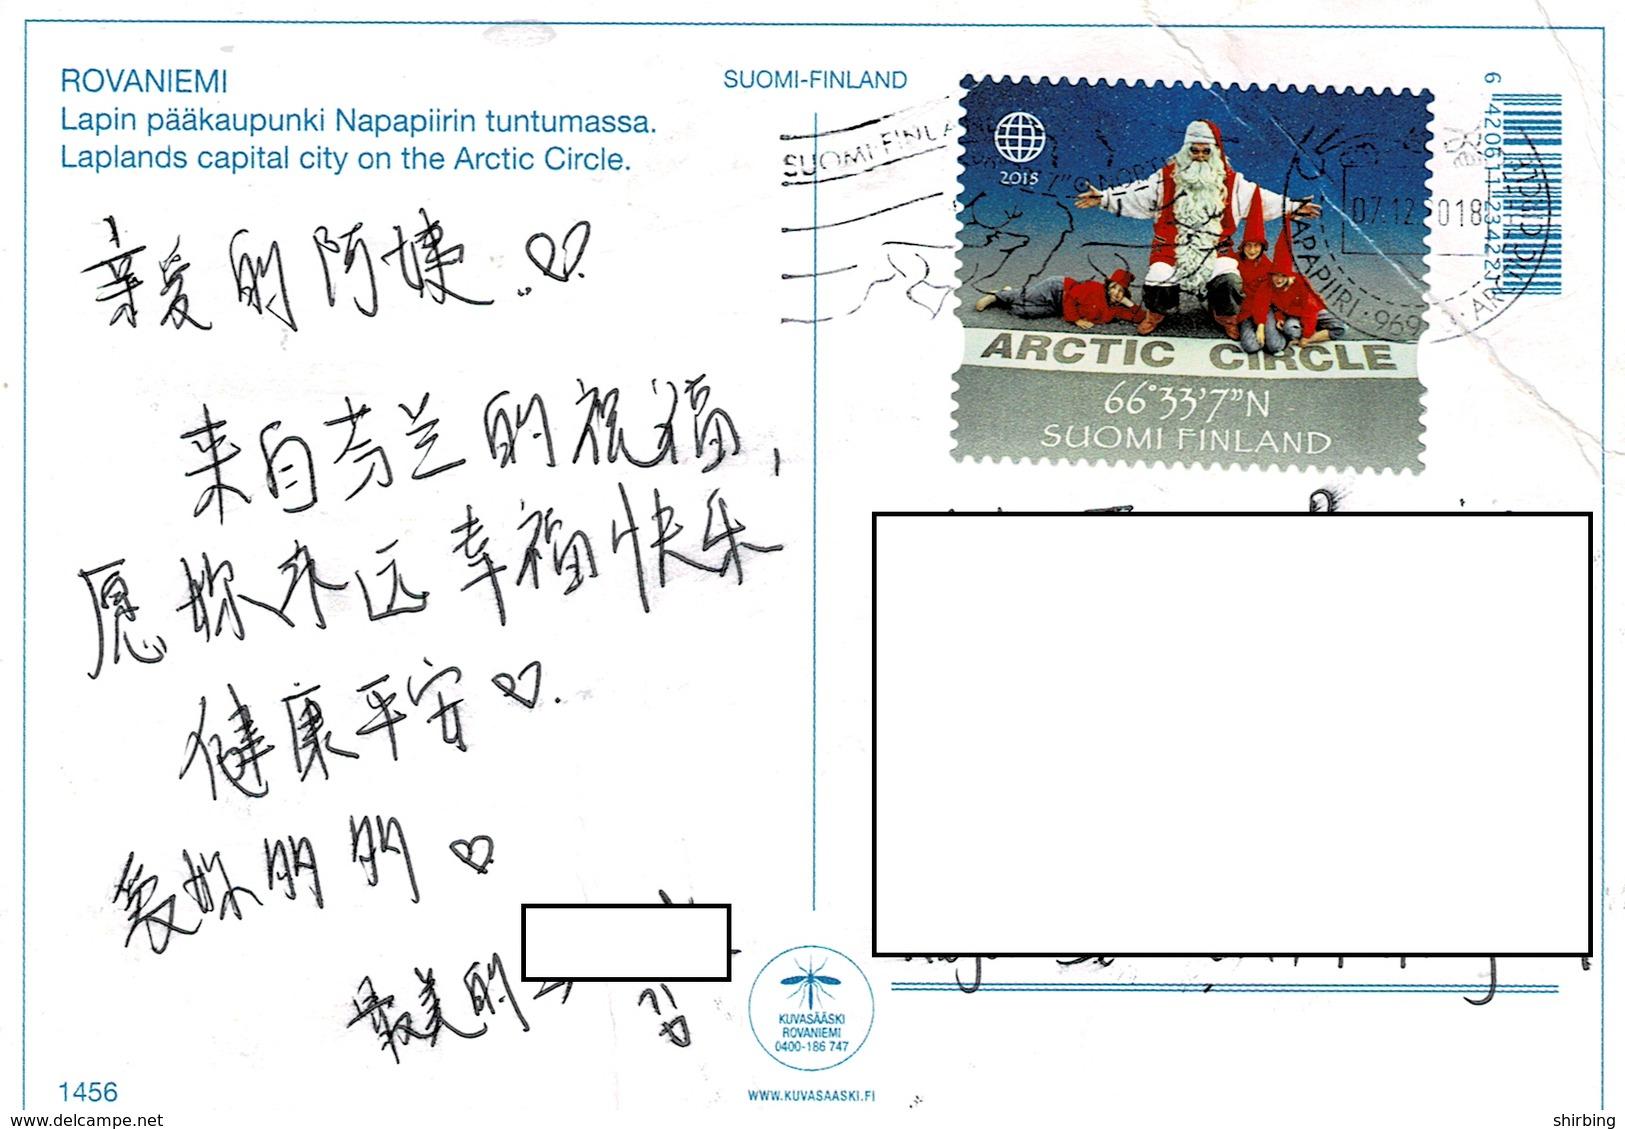 24C : Finland Artic Circle GPS Coordinate,Santa Claus Stamp Used On Rovaniemi Artic Cirlce Postcard - Finland